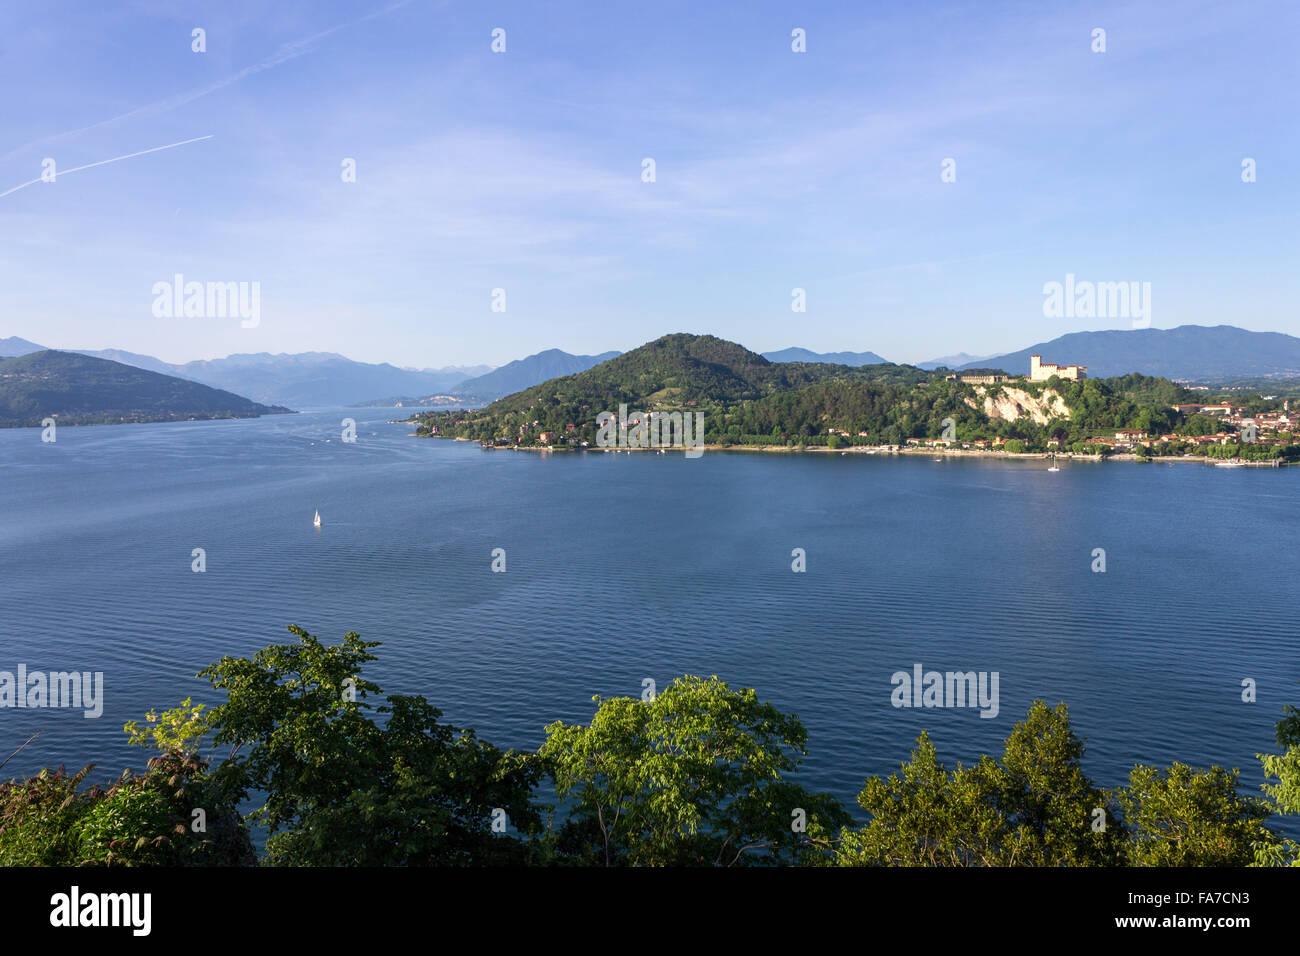 Italy, Piedmont, Arona, Lake Maggiore - Stock Image